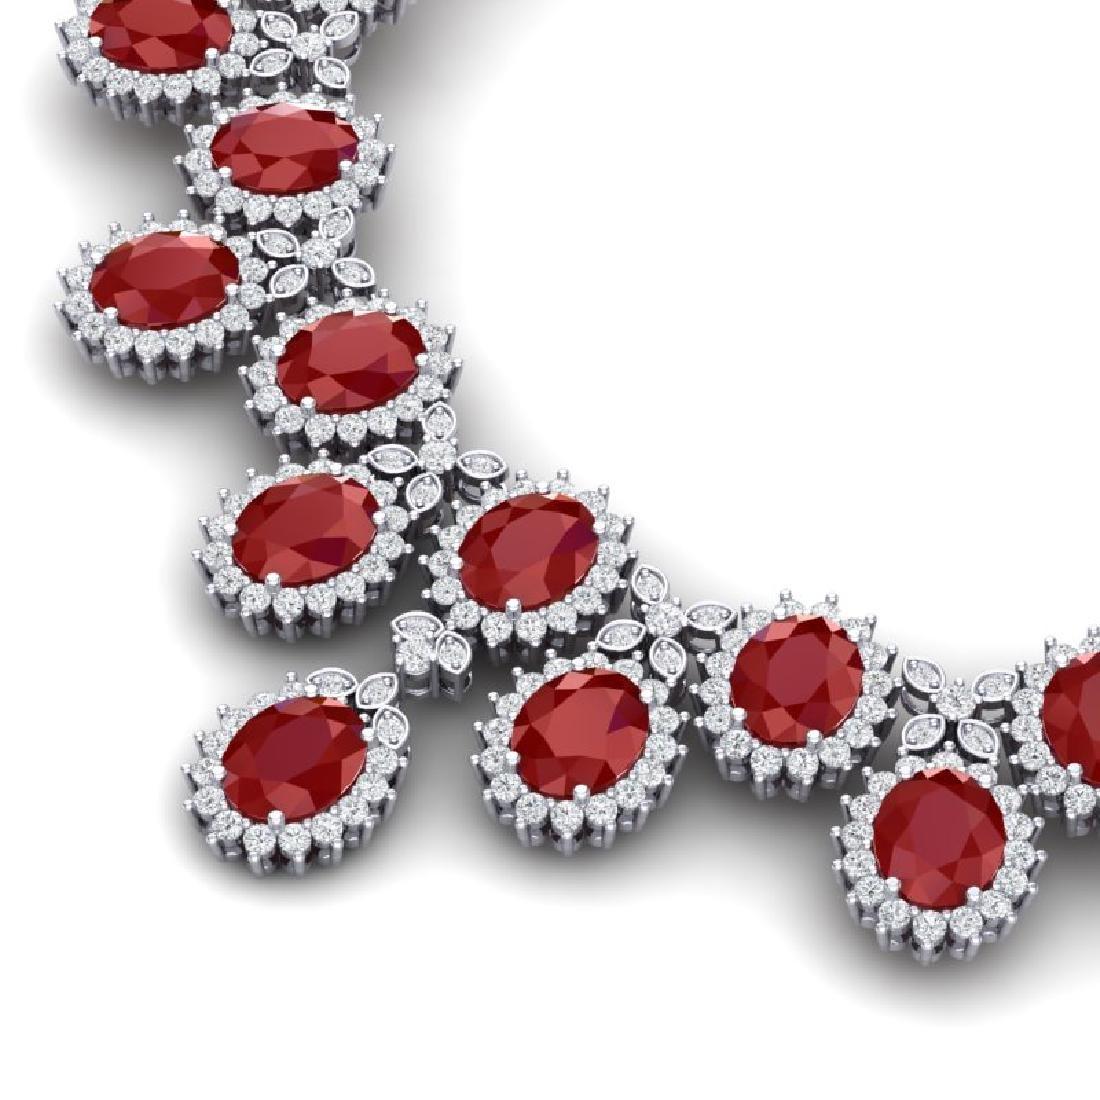 81 CTW Royalty Designer Ruby & VS Diamond Necklace 18K - 2